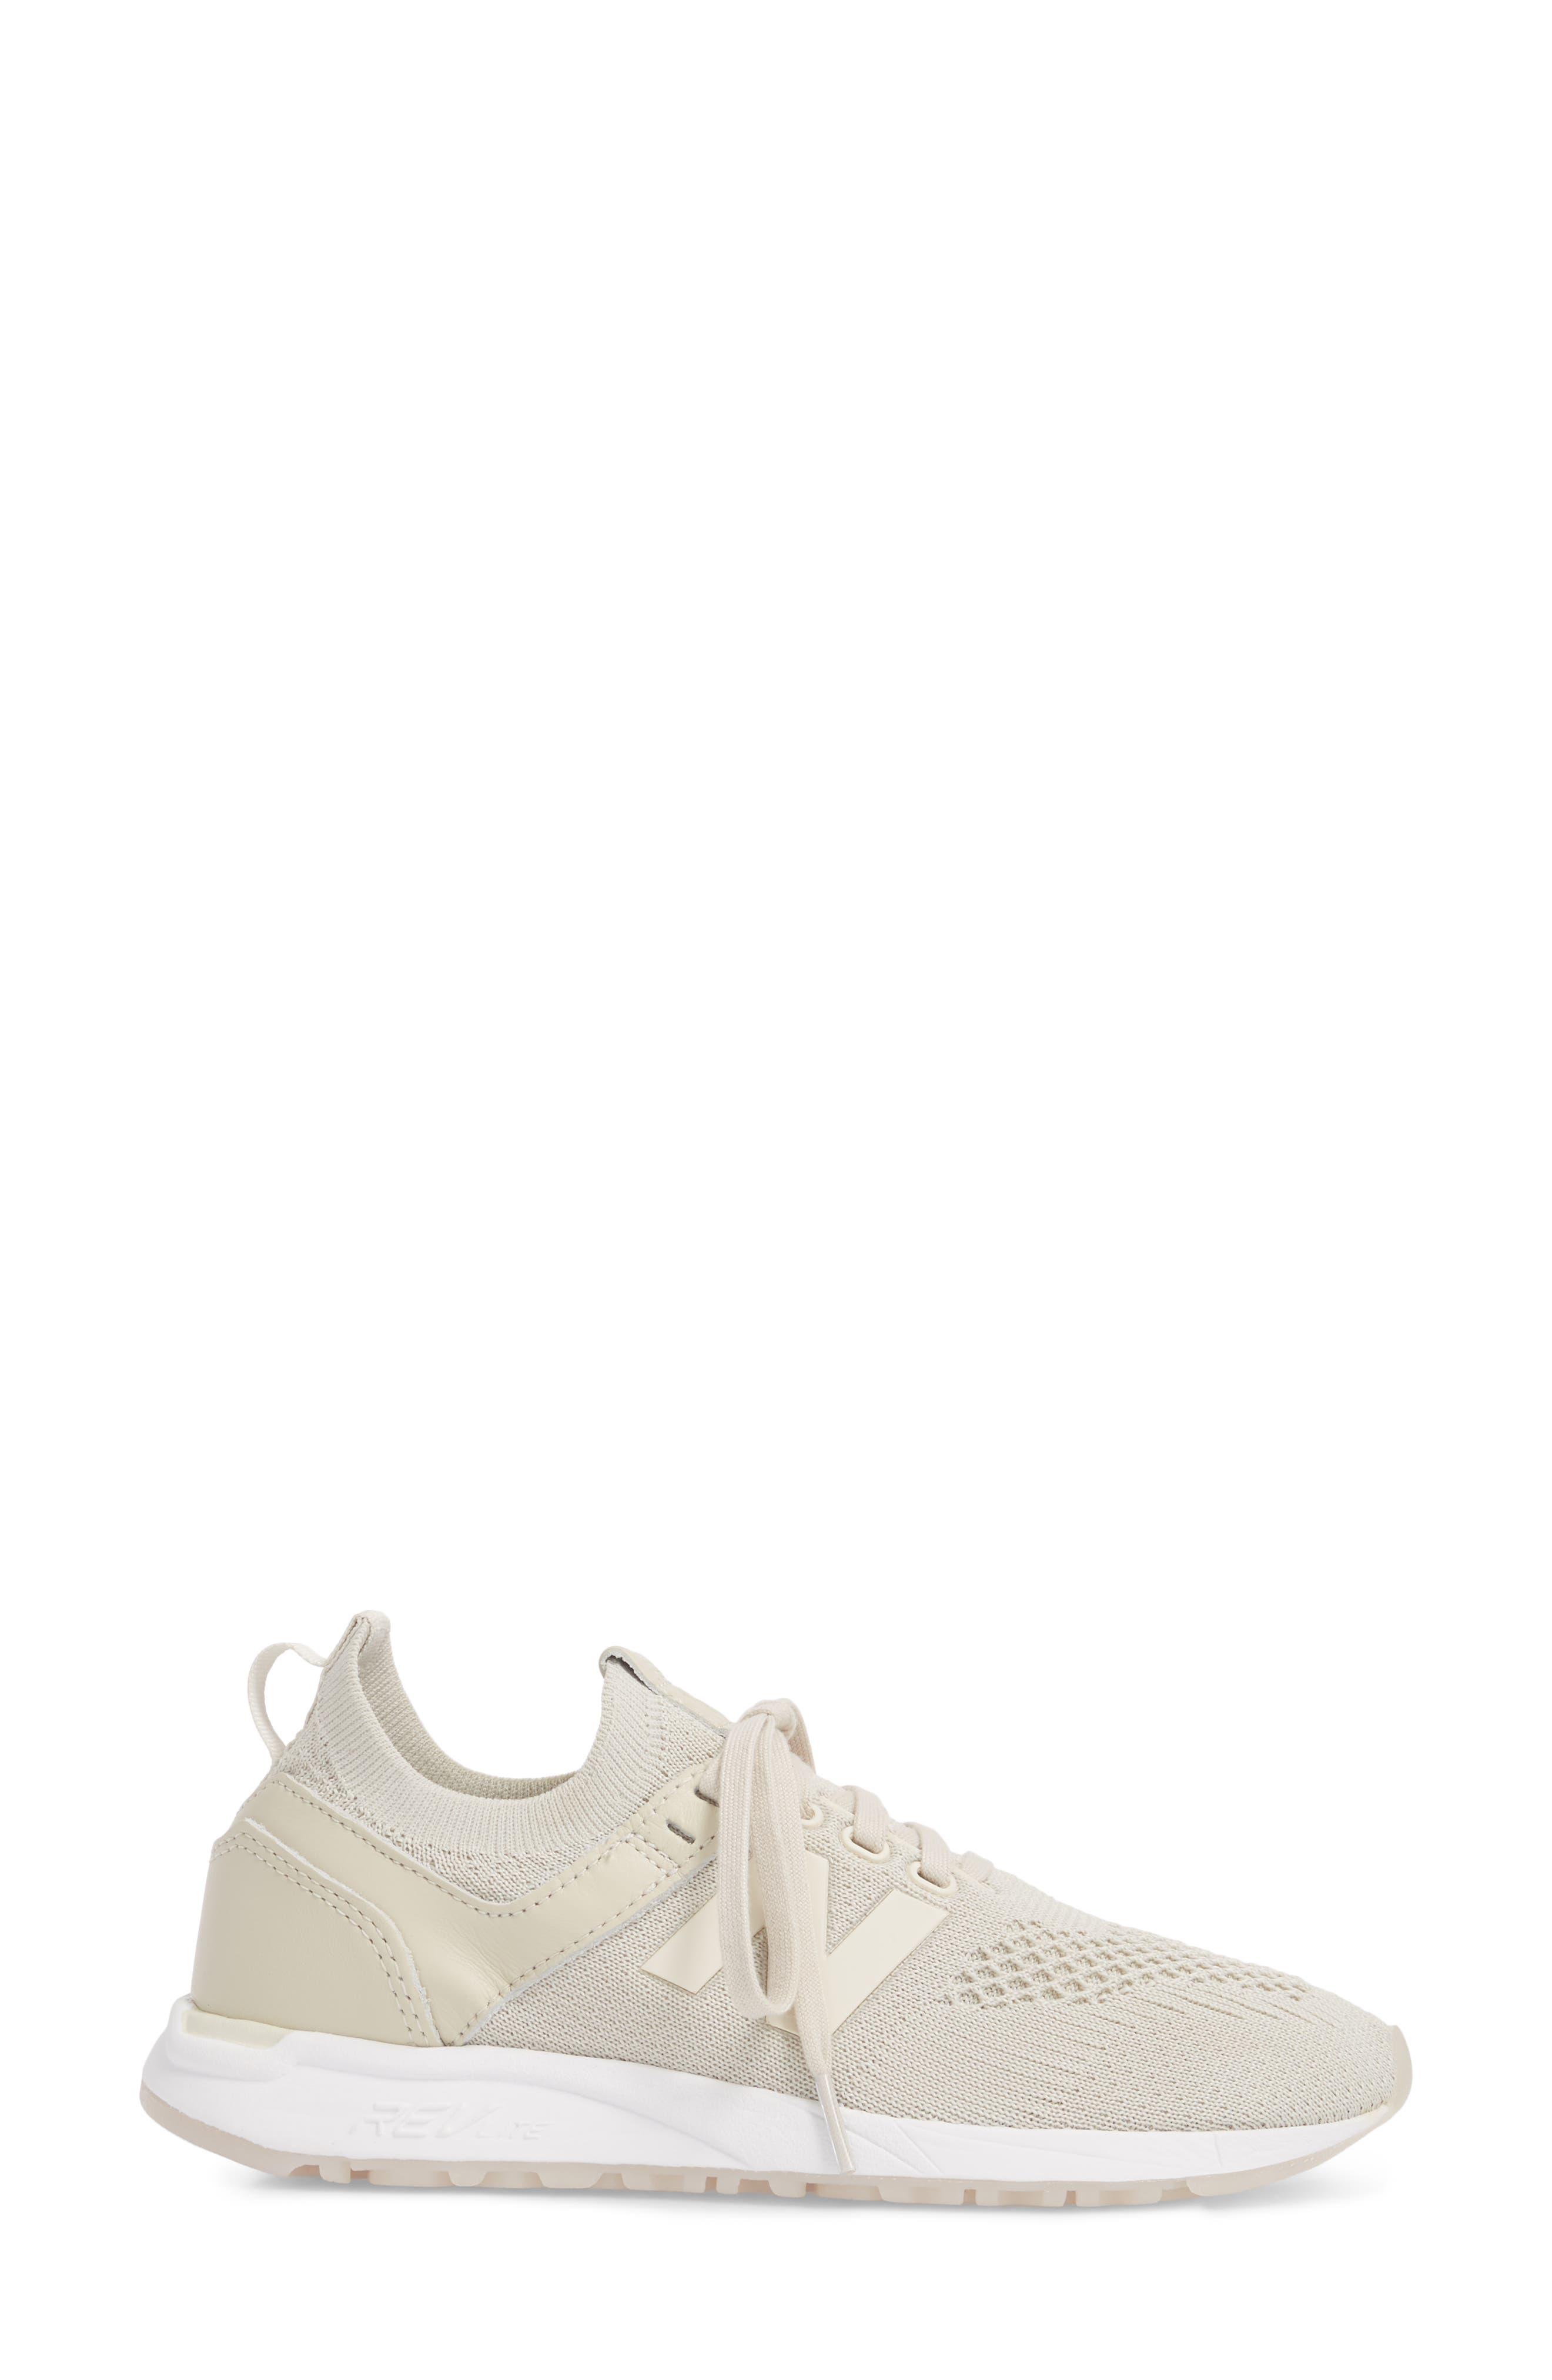 247 Decon Knit Sneaker,                             Alternate thumbnail 8, color,